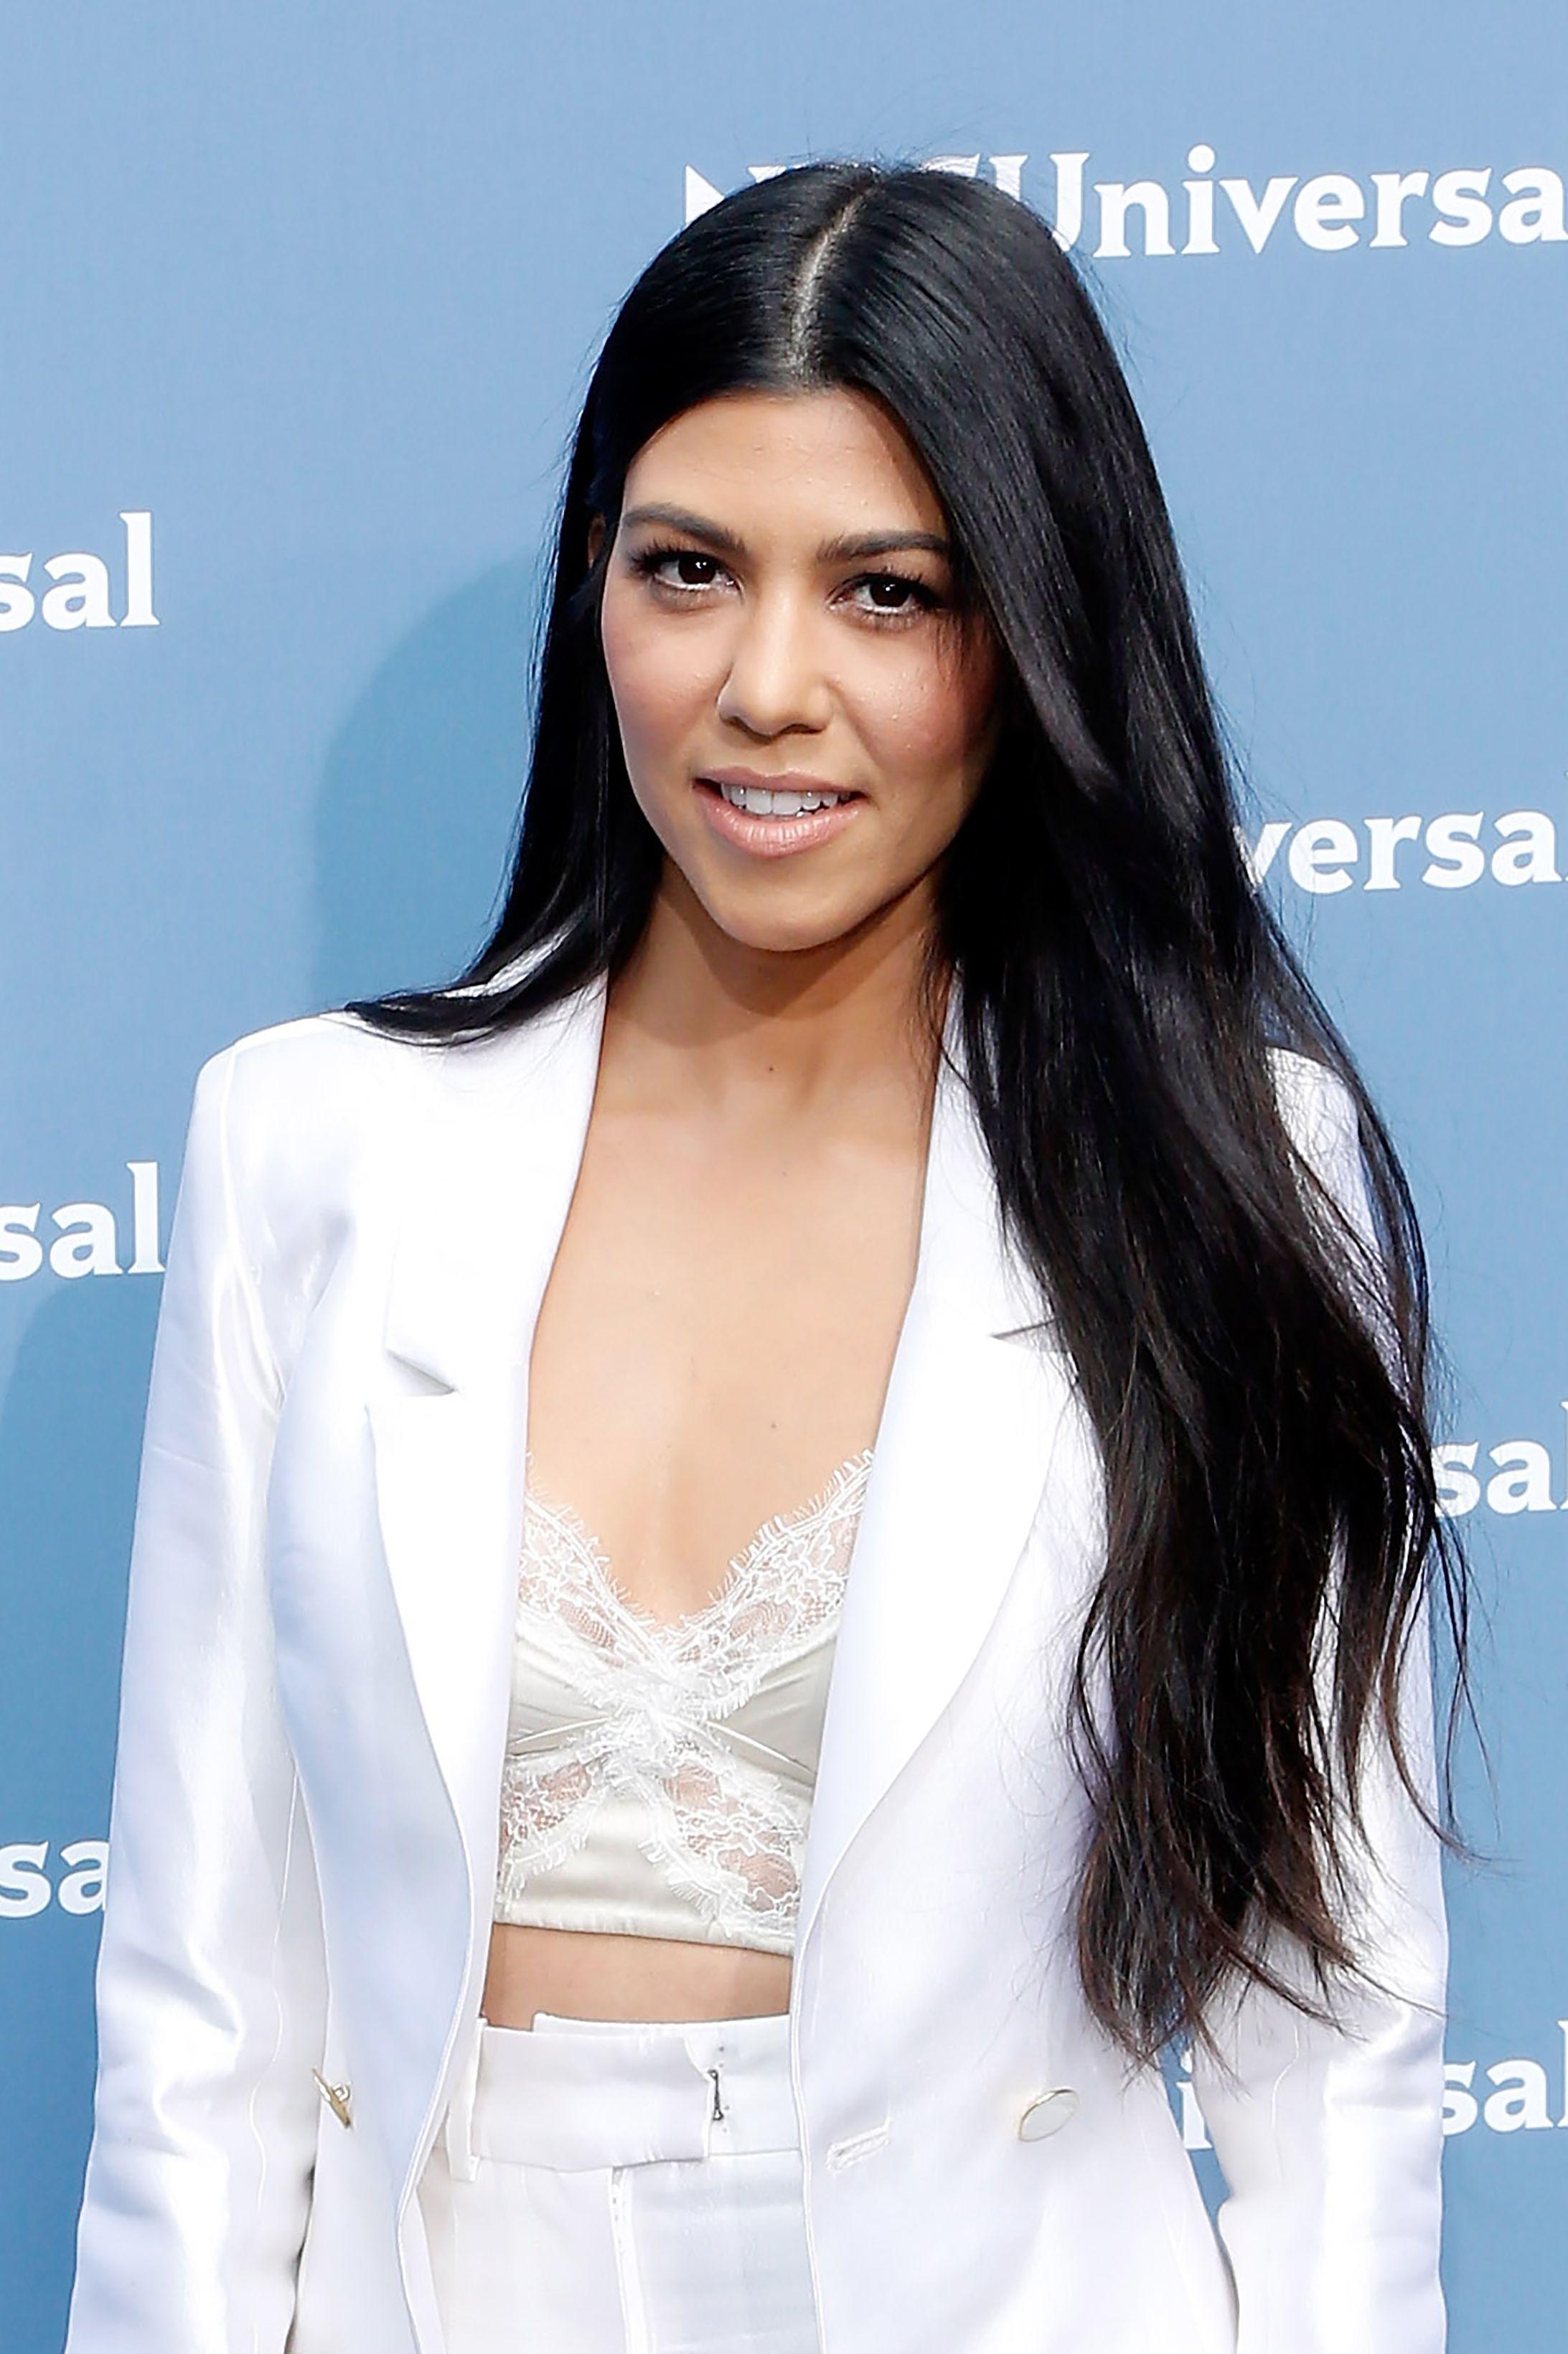 35 Times the Kardashian-Jenners Were HairGoals